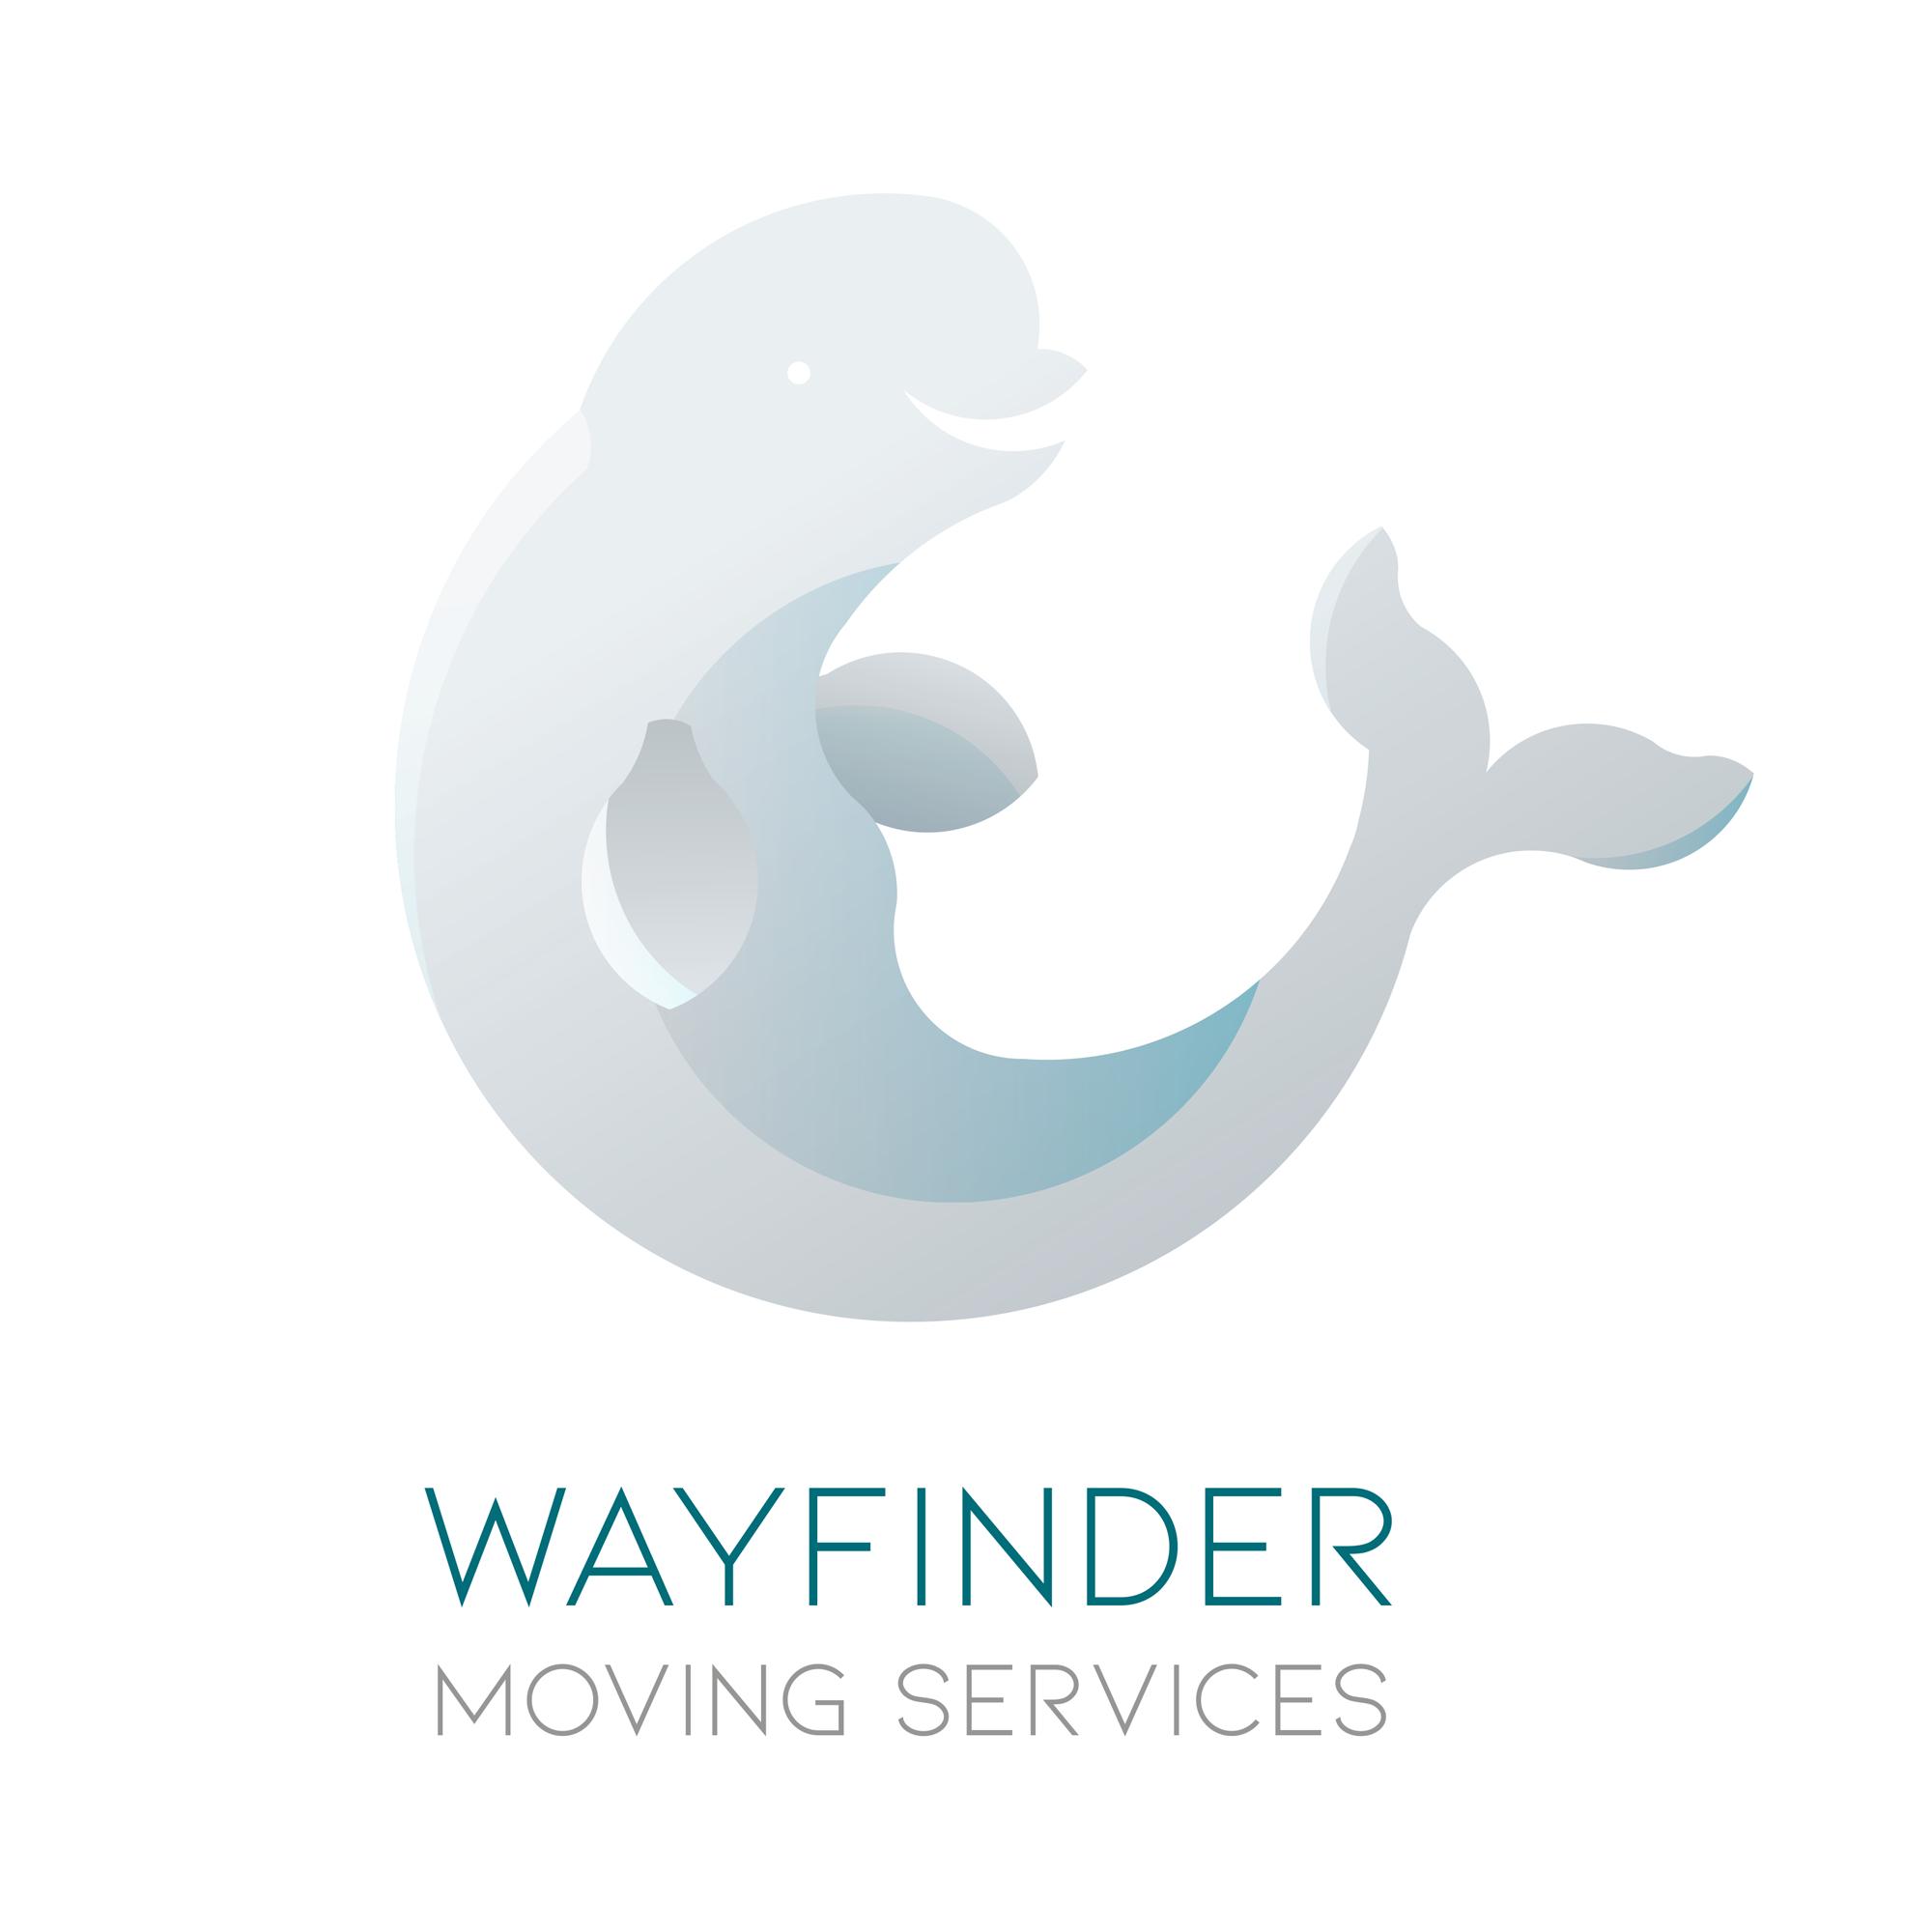 wayfinder web logo.png